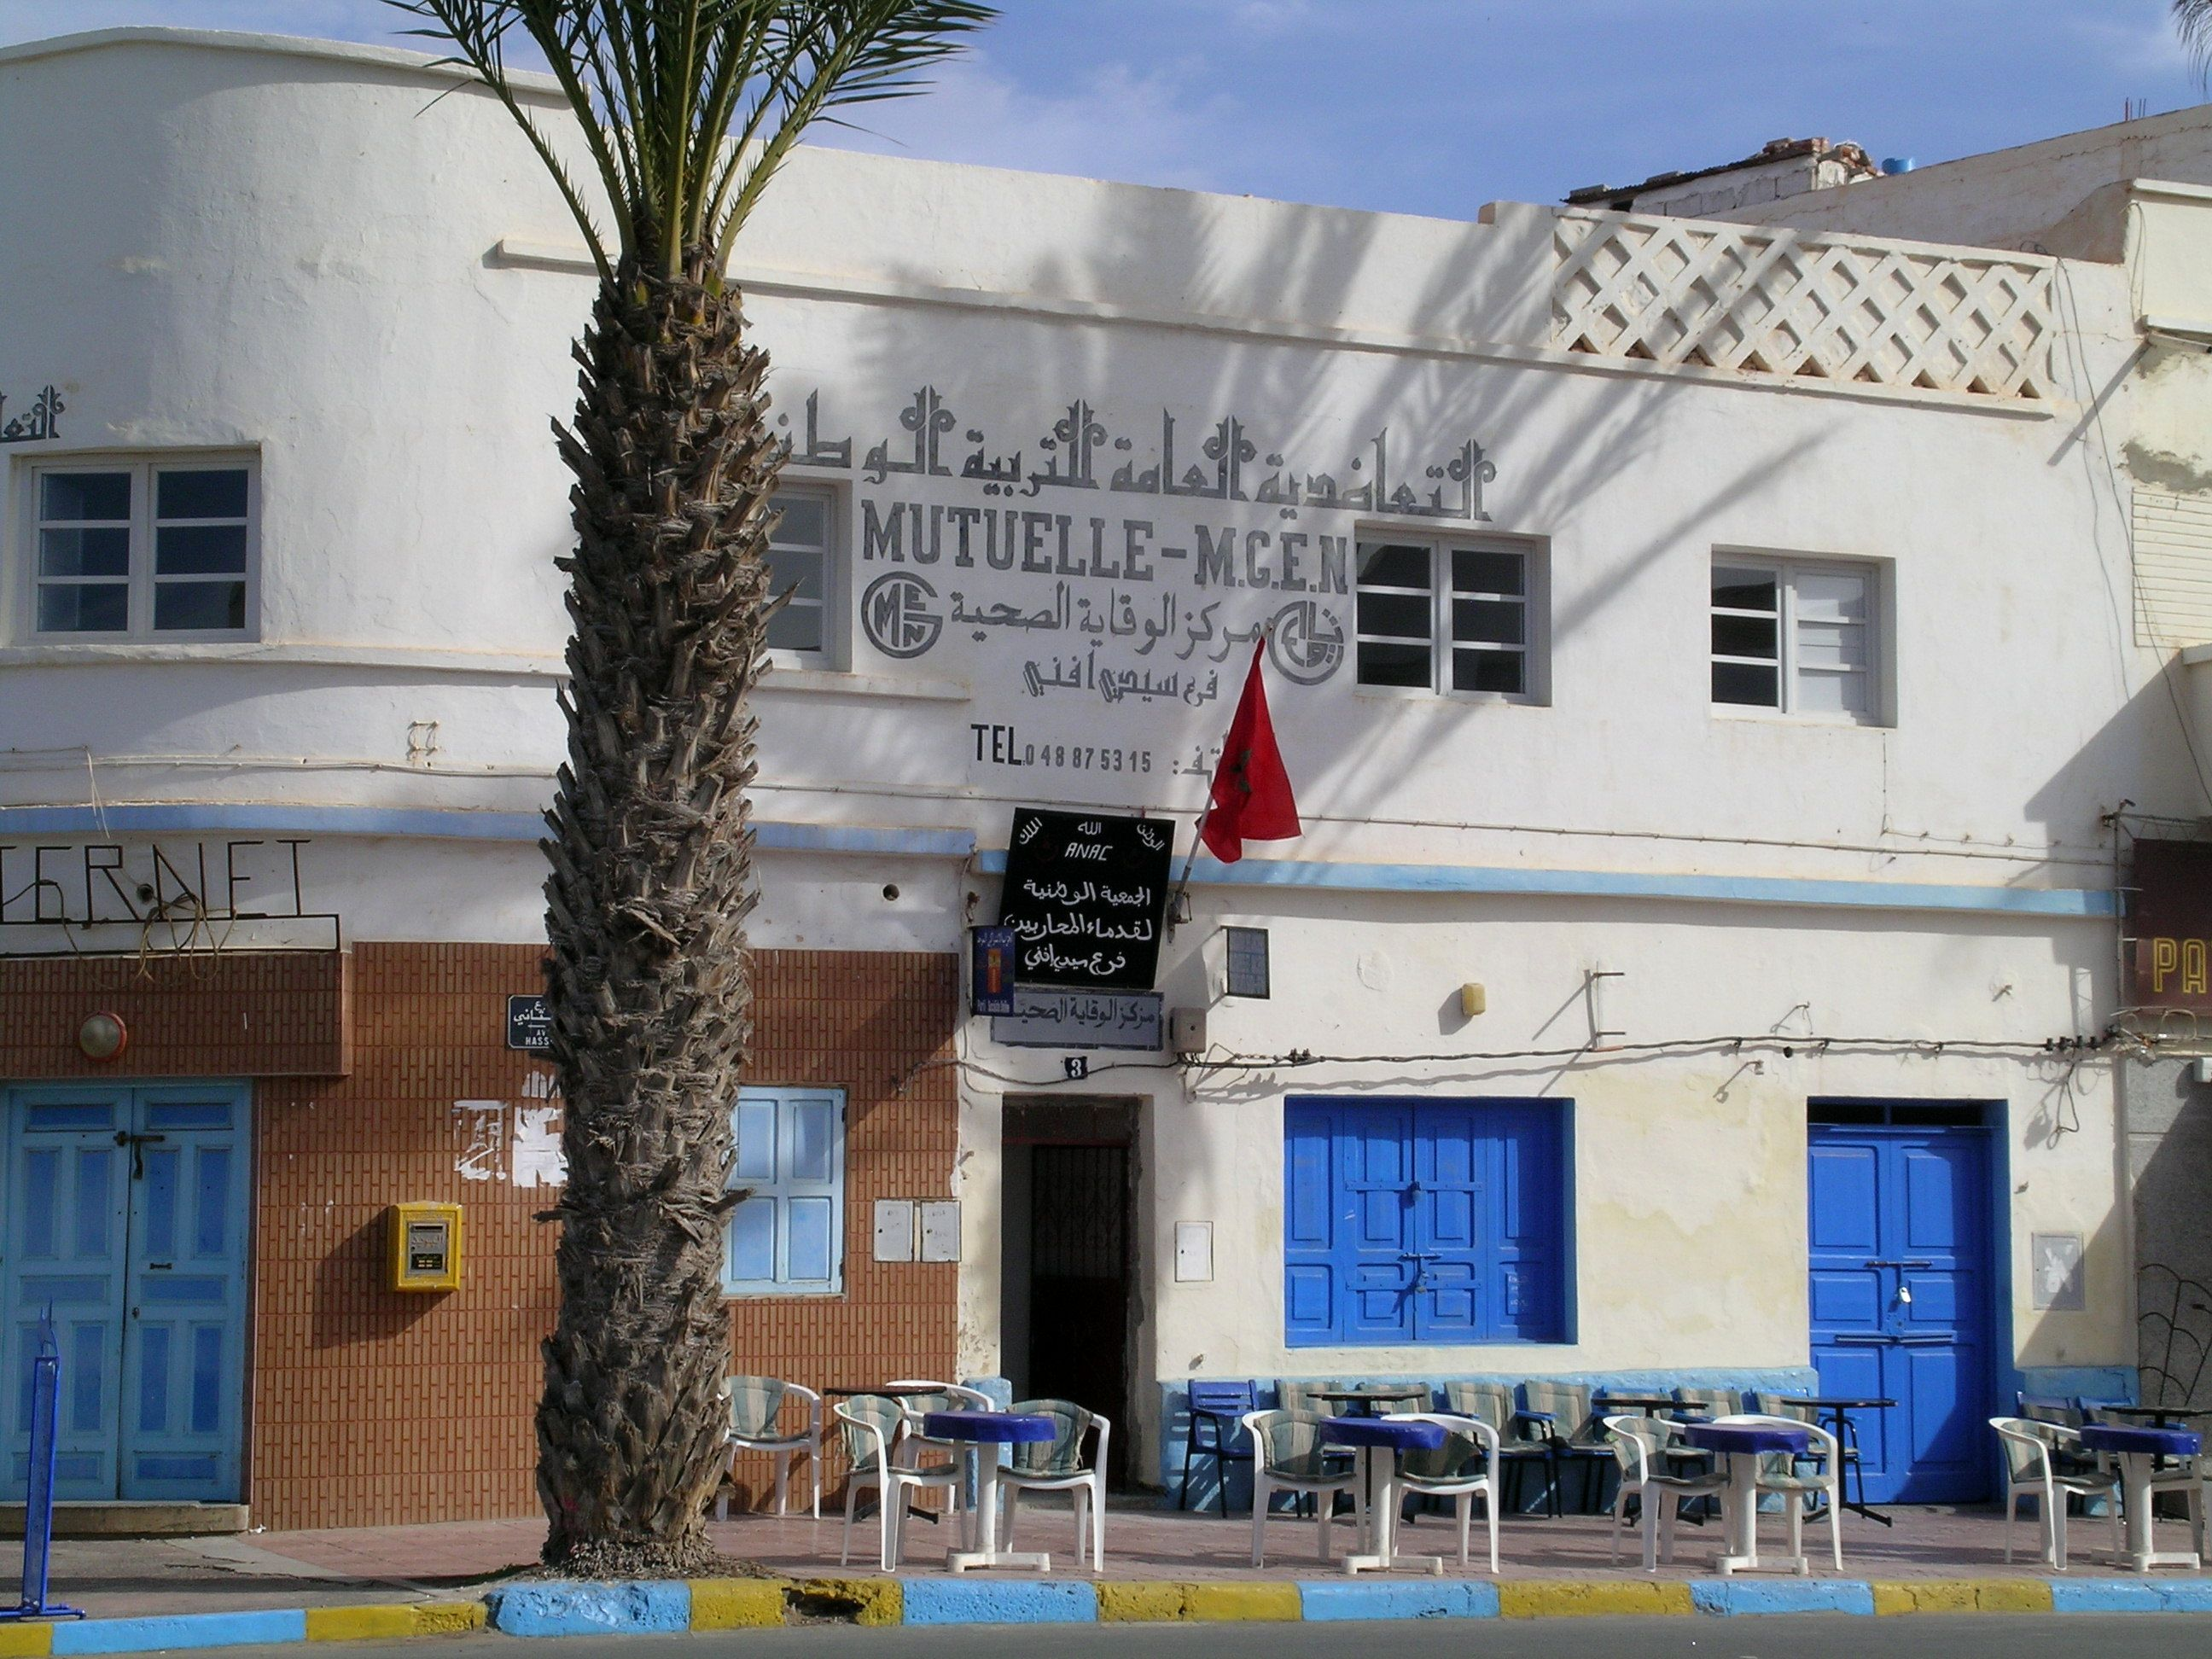 Edificio de la Mutuelle generale de leducation nationale en Sidi Ifni (Marruecos).jpg Español: Edificio de la Mutuelle générale de l'éducation nationale